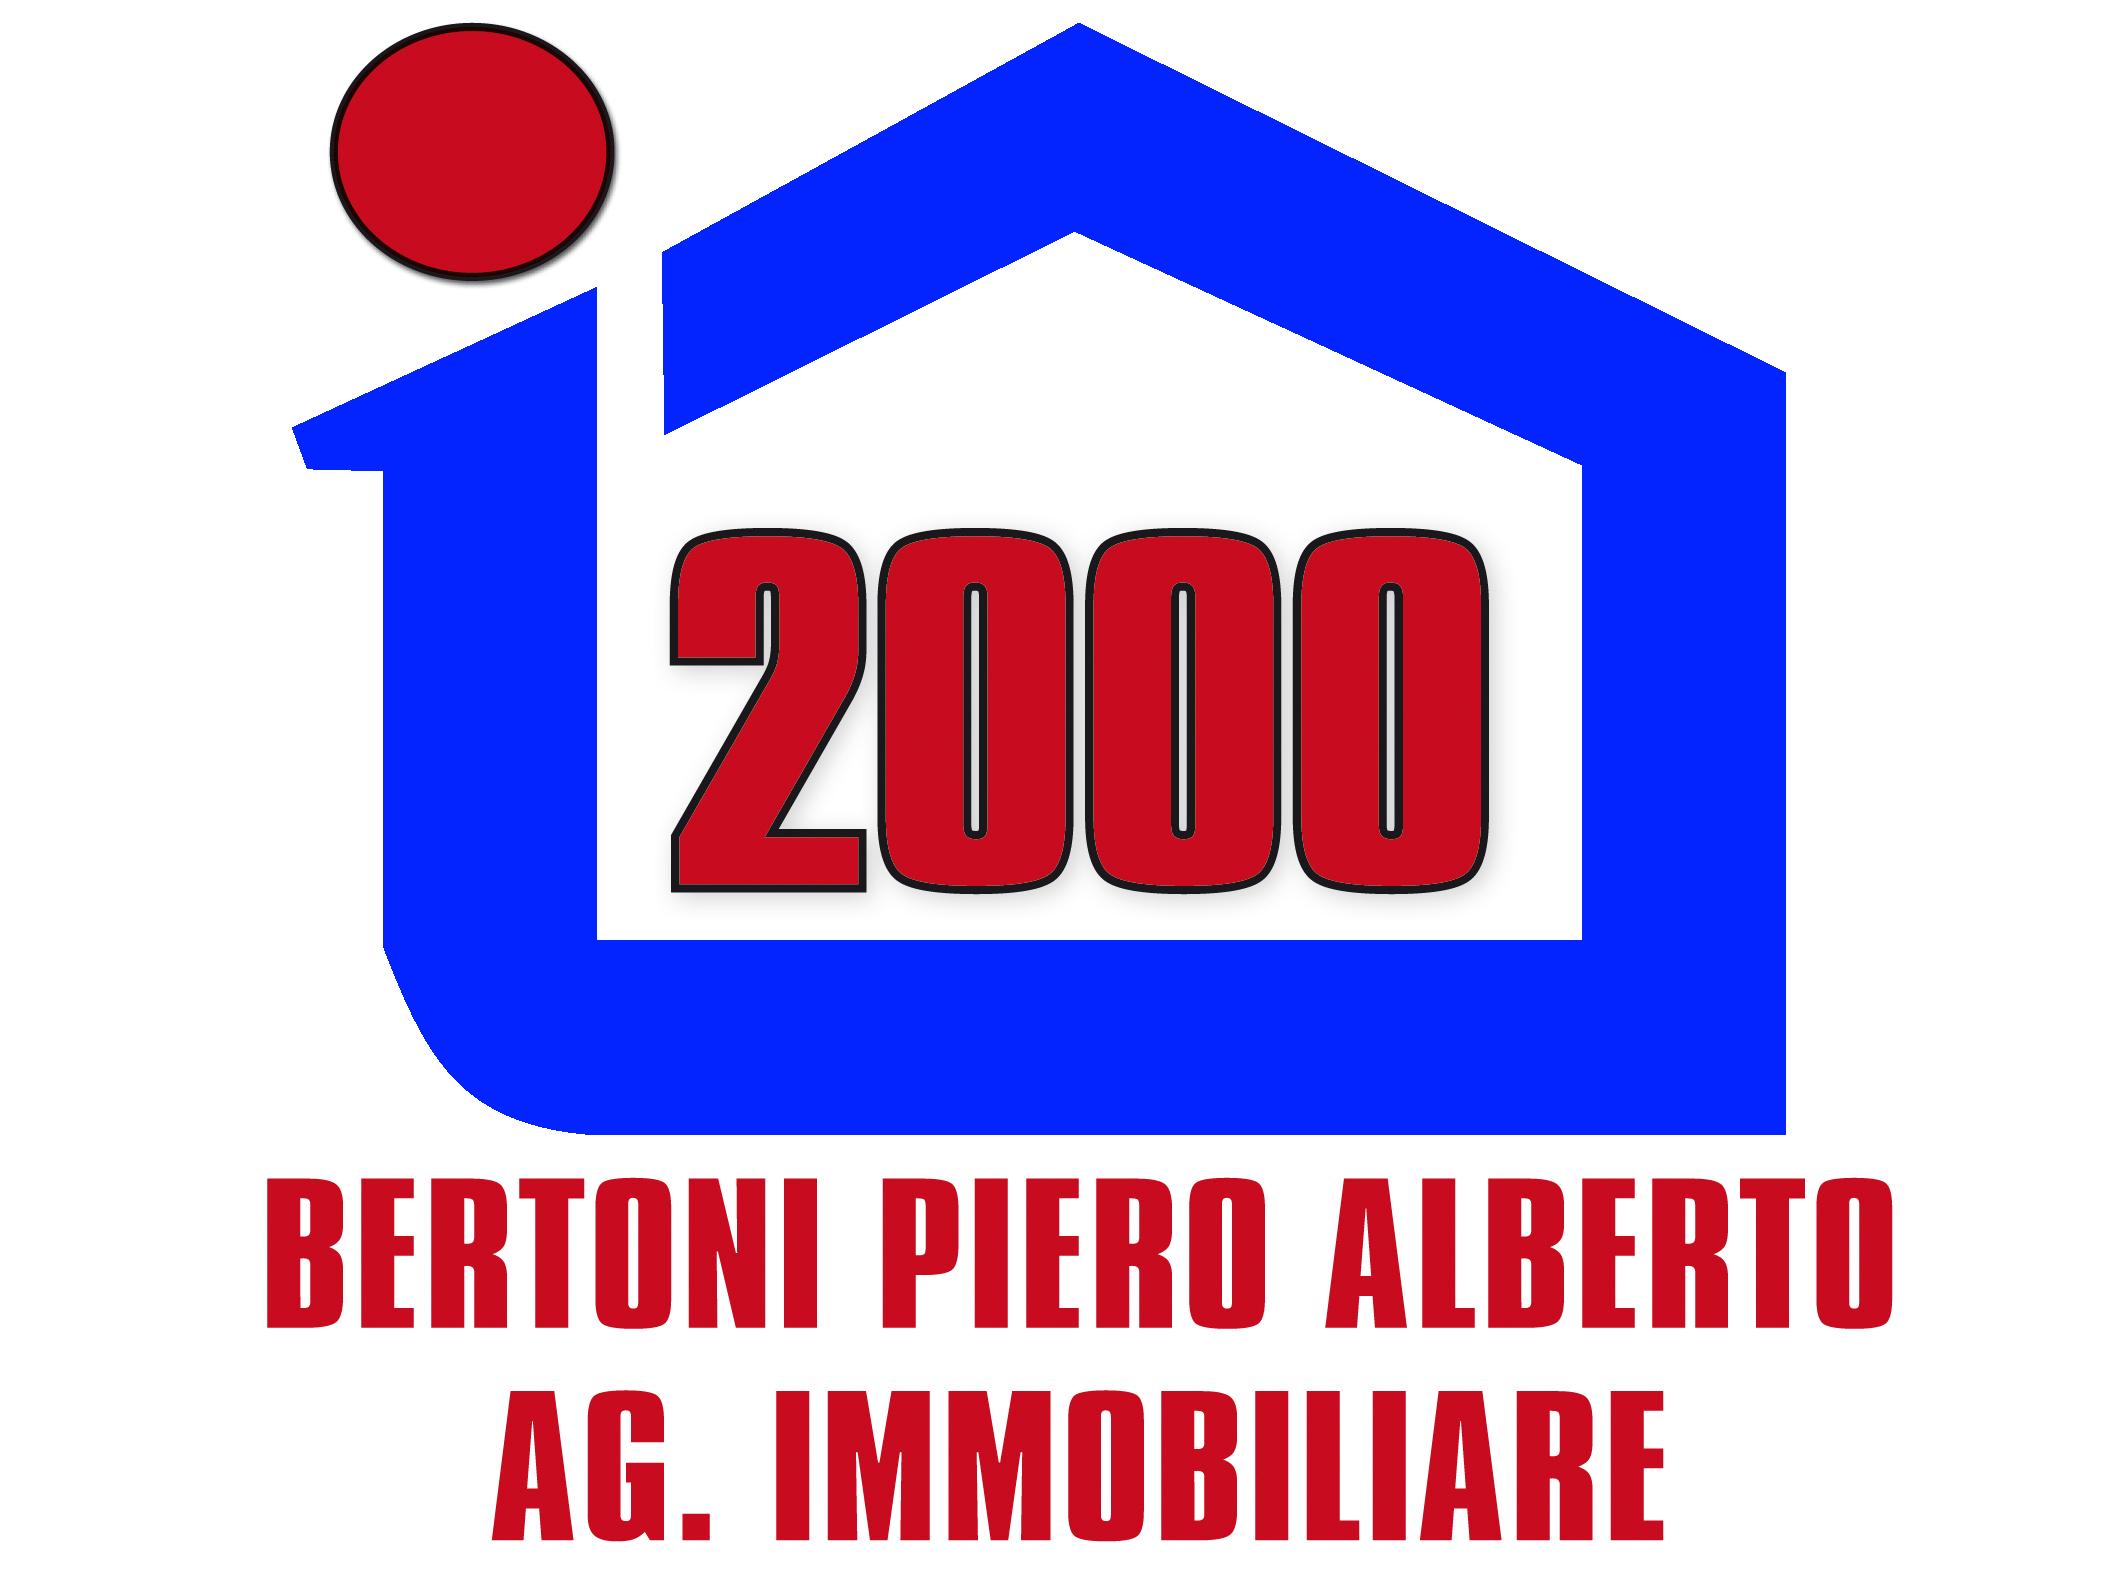 Geom. Bertoni Piero Alberto Ag. Immobiliare